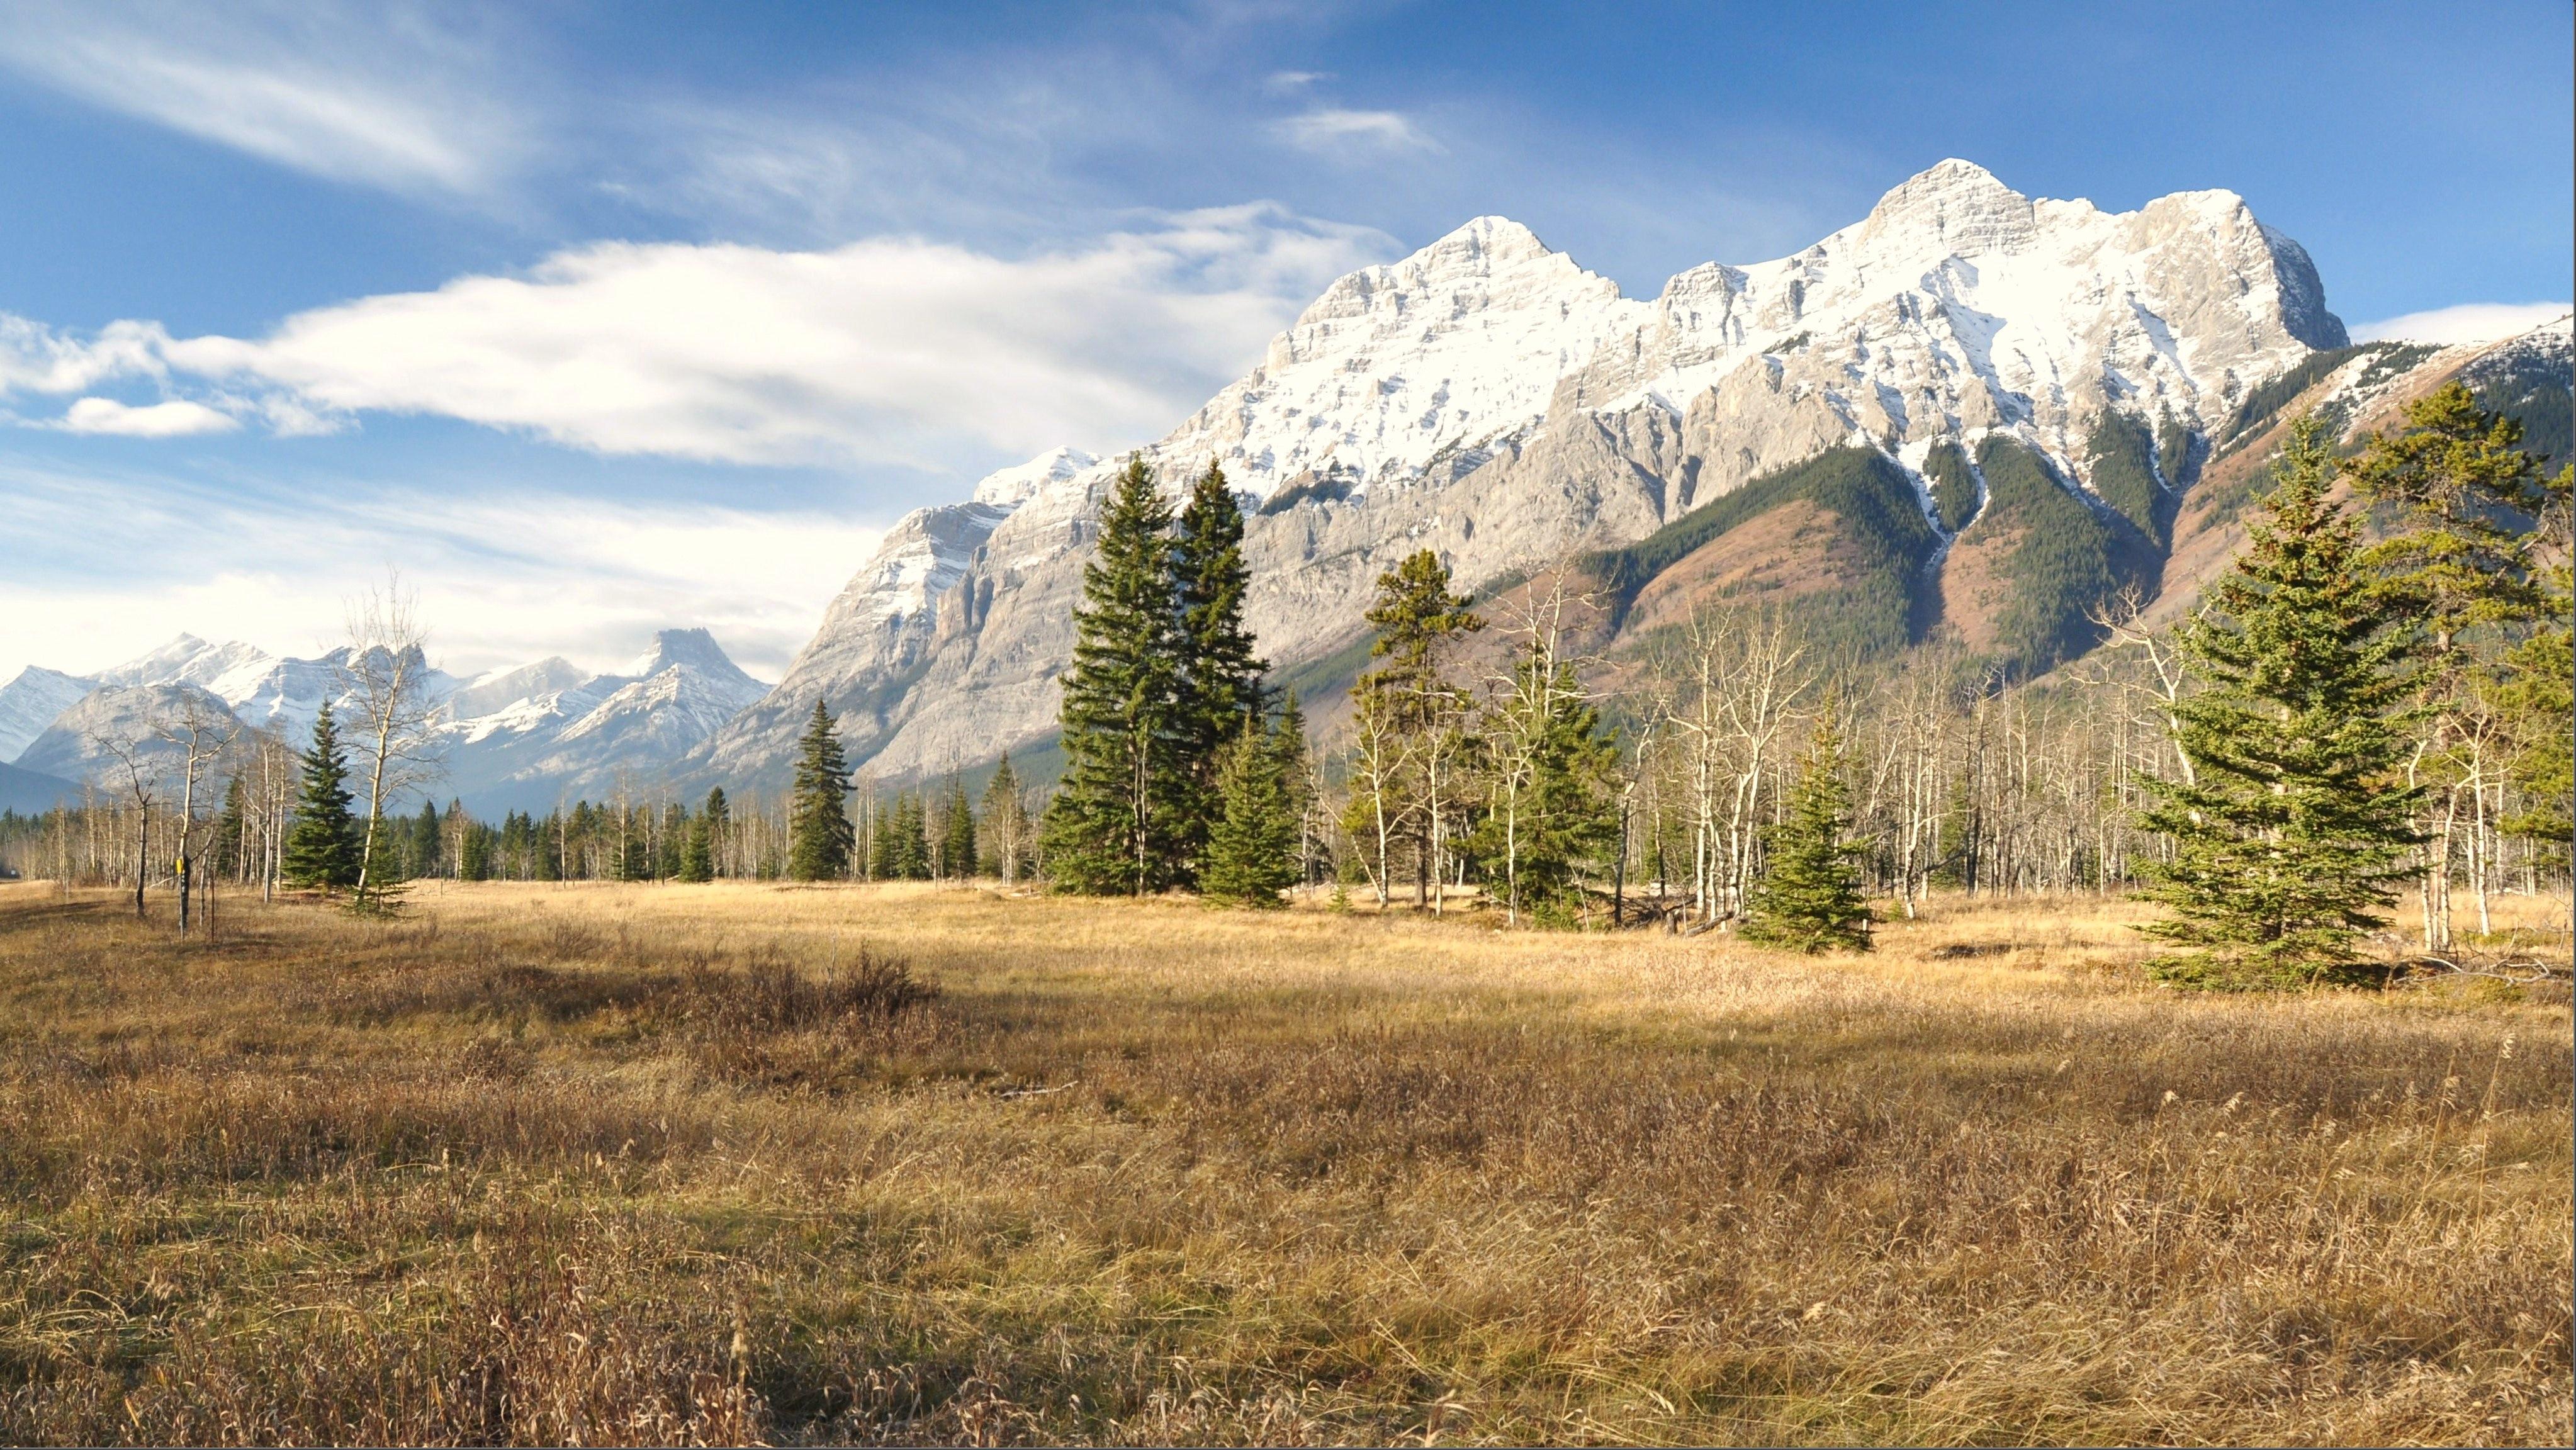 Kananaskis Country, Alberta - Bruce Witzel photo